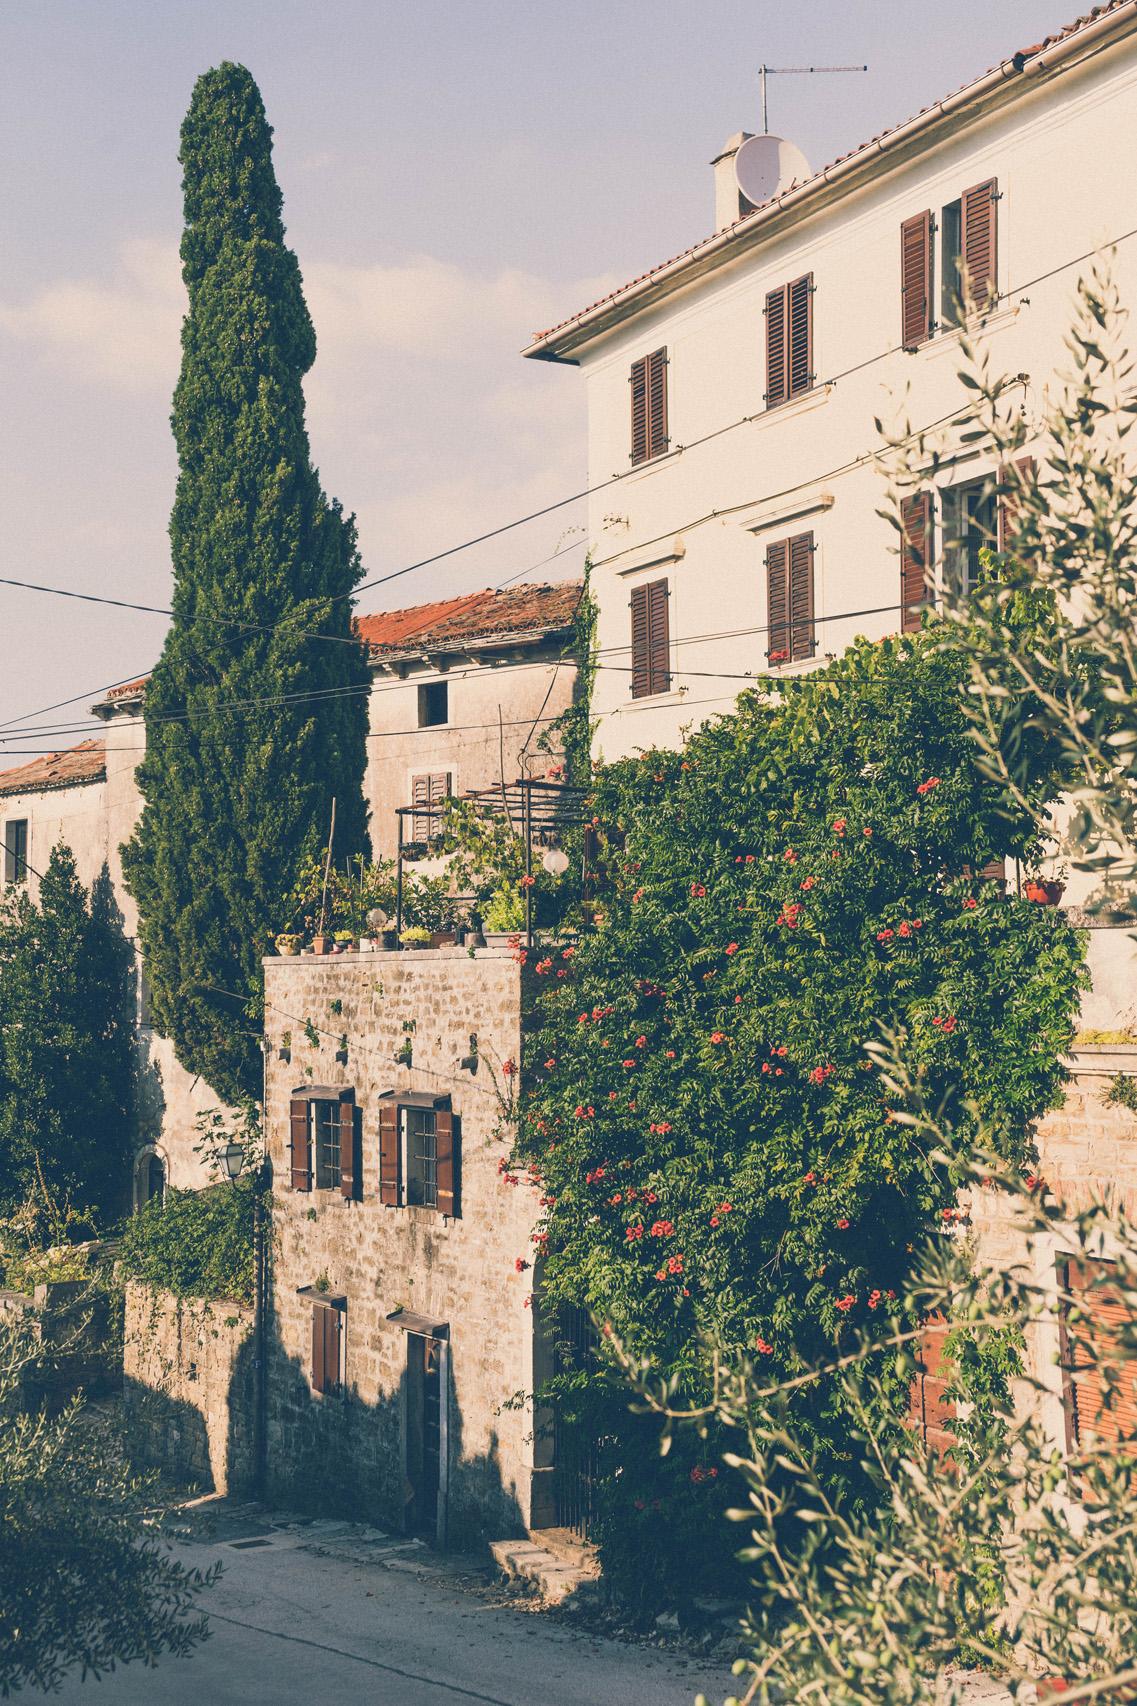 Hilltop town of Oprtalj, Istria